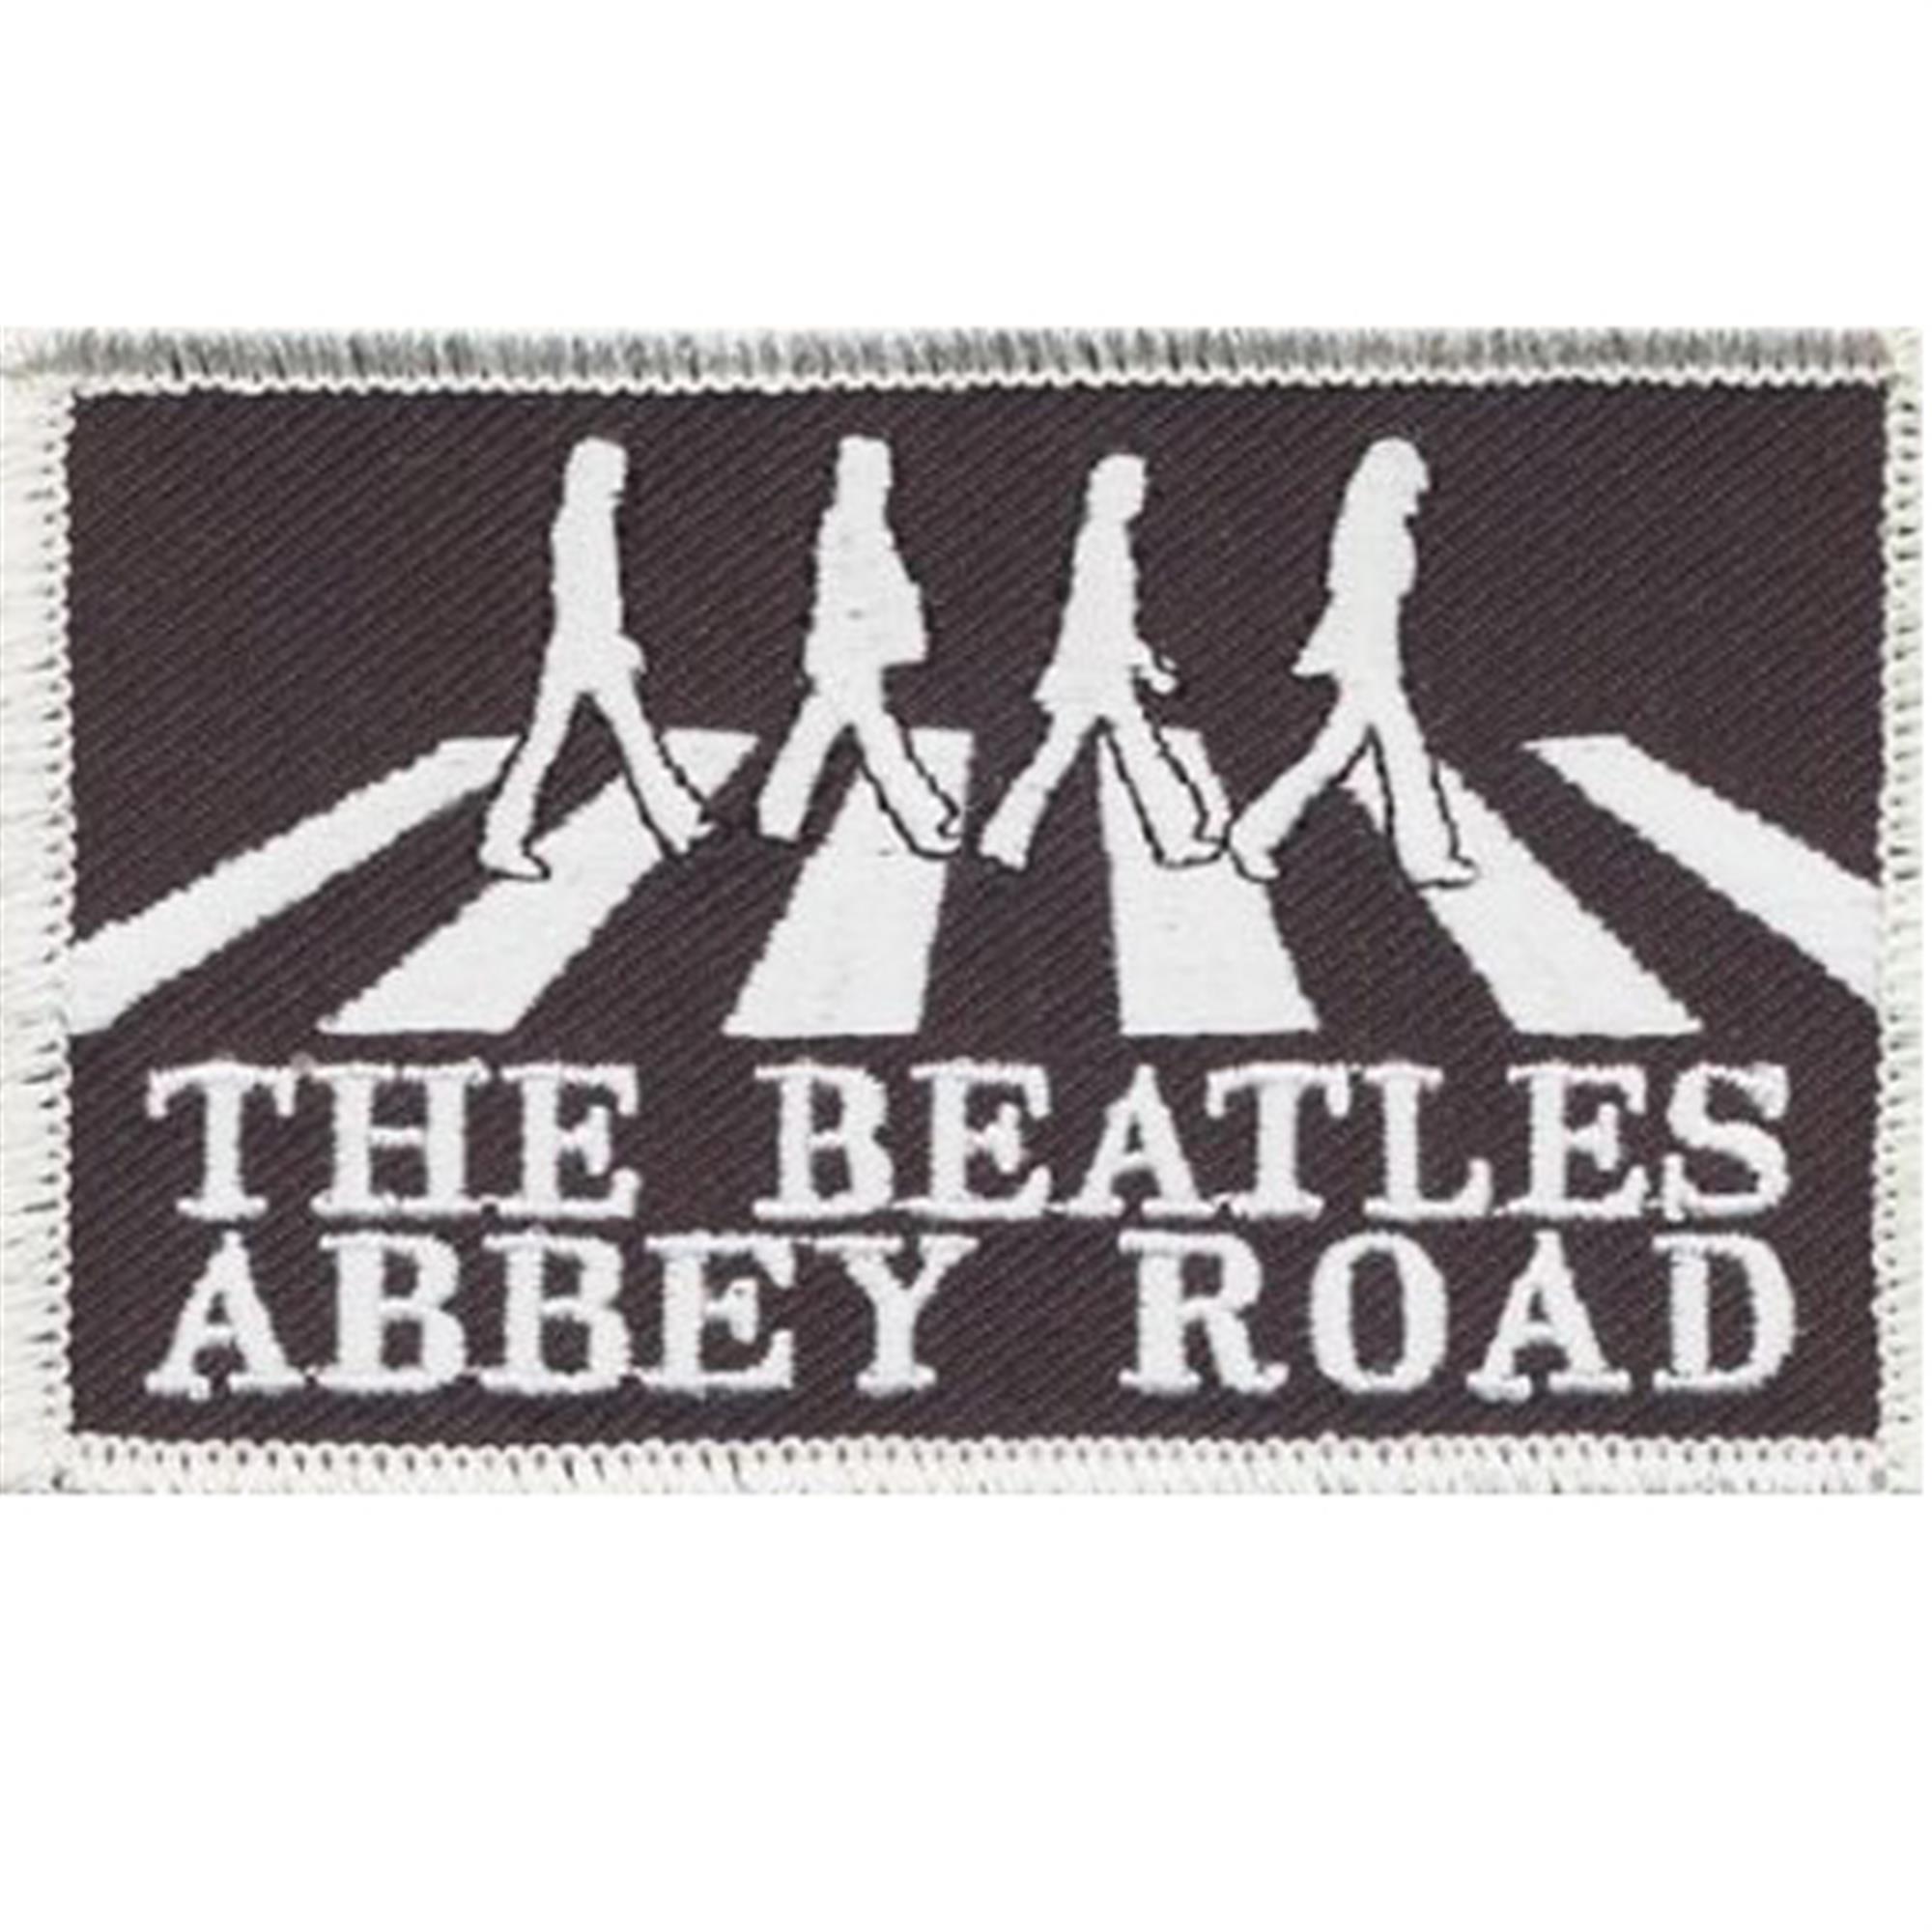 Abbey Road White Border Patch